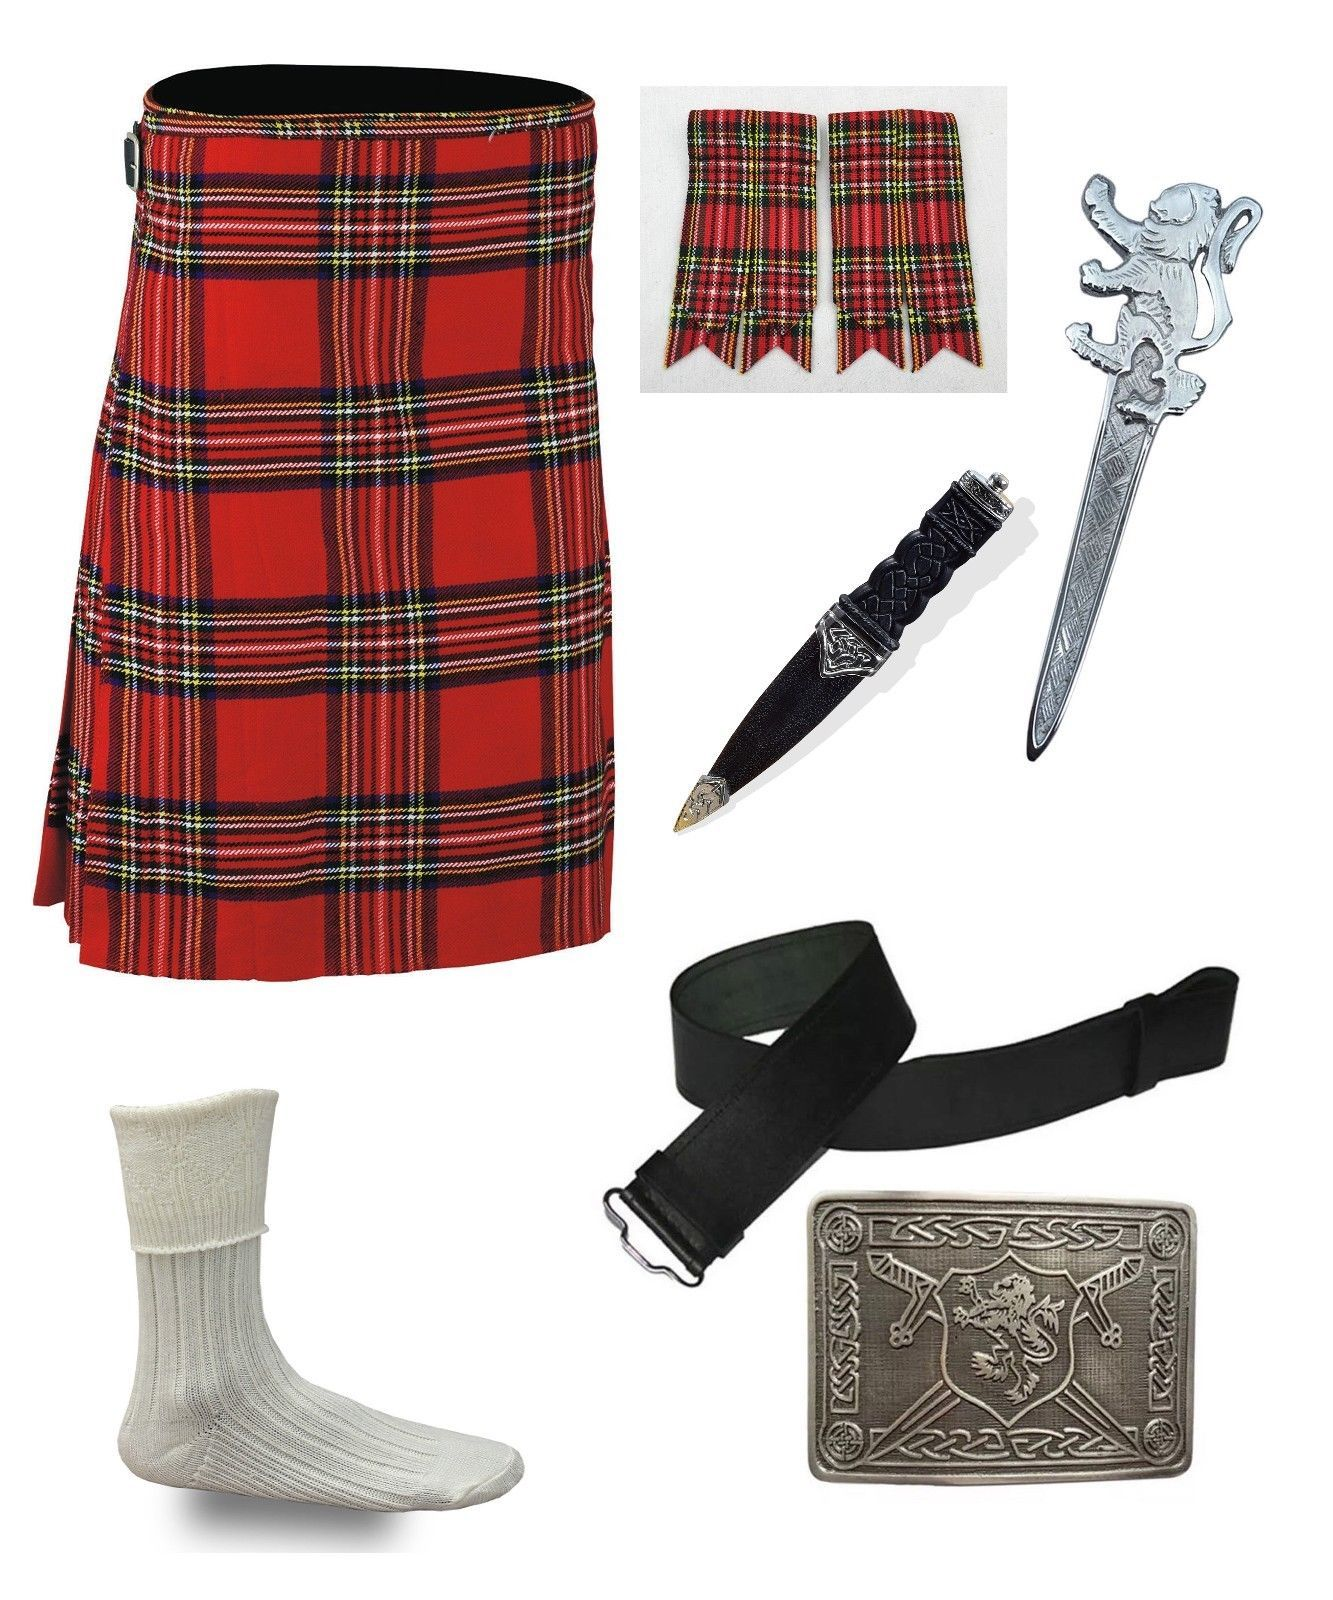 Scottish Kilt Sporran Formal Seal Skin Stag Head Buckle Pin Plaid Brooch Antique